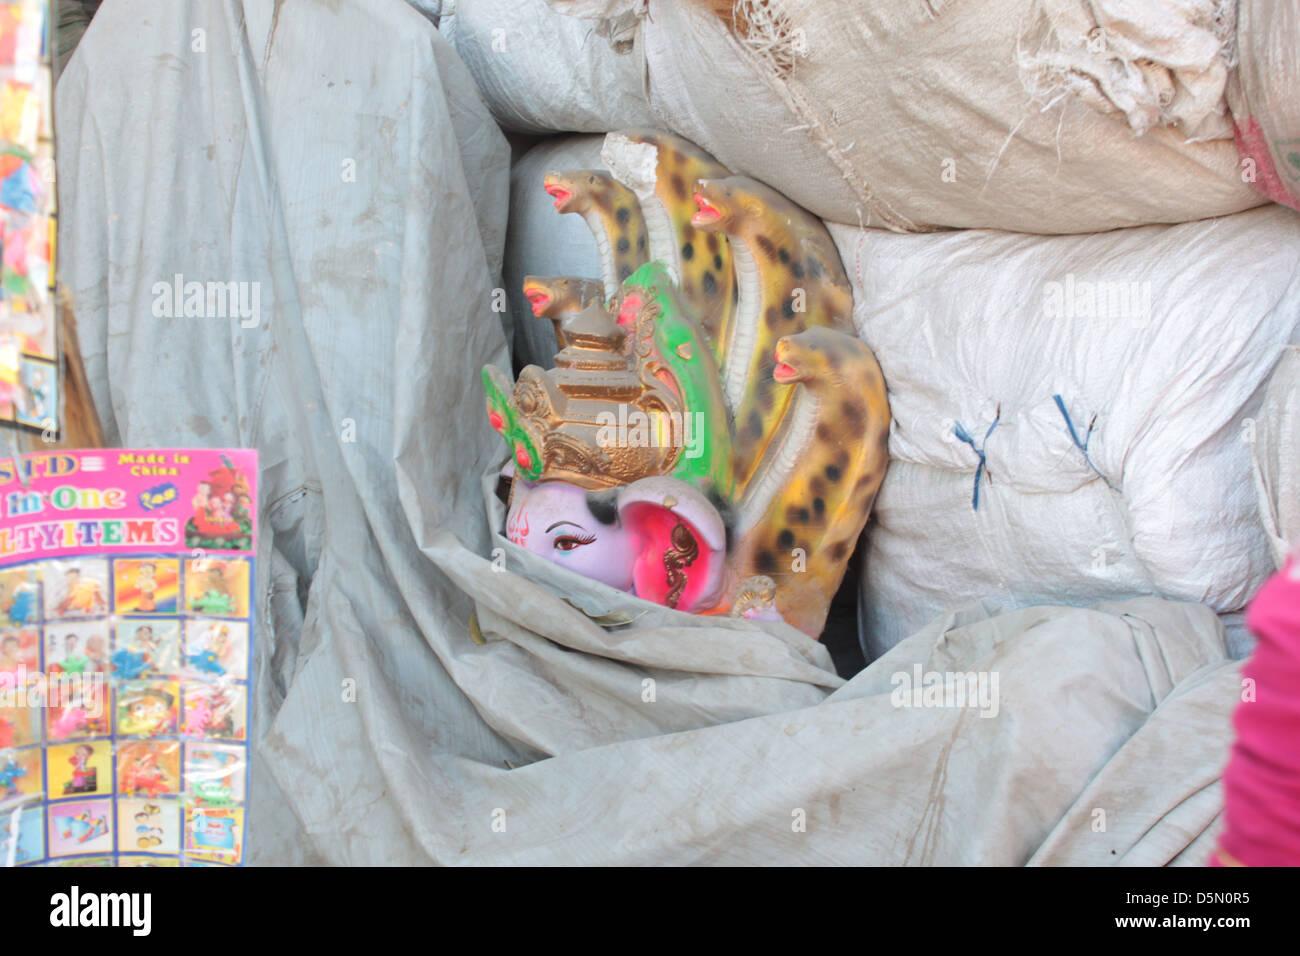 An idol of Hindu God, Ganesh, lies hidden behind sacks in the Gulbai Tekra locality of craftsmen, Ahmedabad, Gujarat, - Stock Image